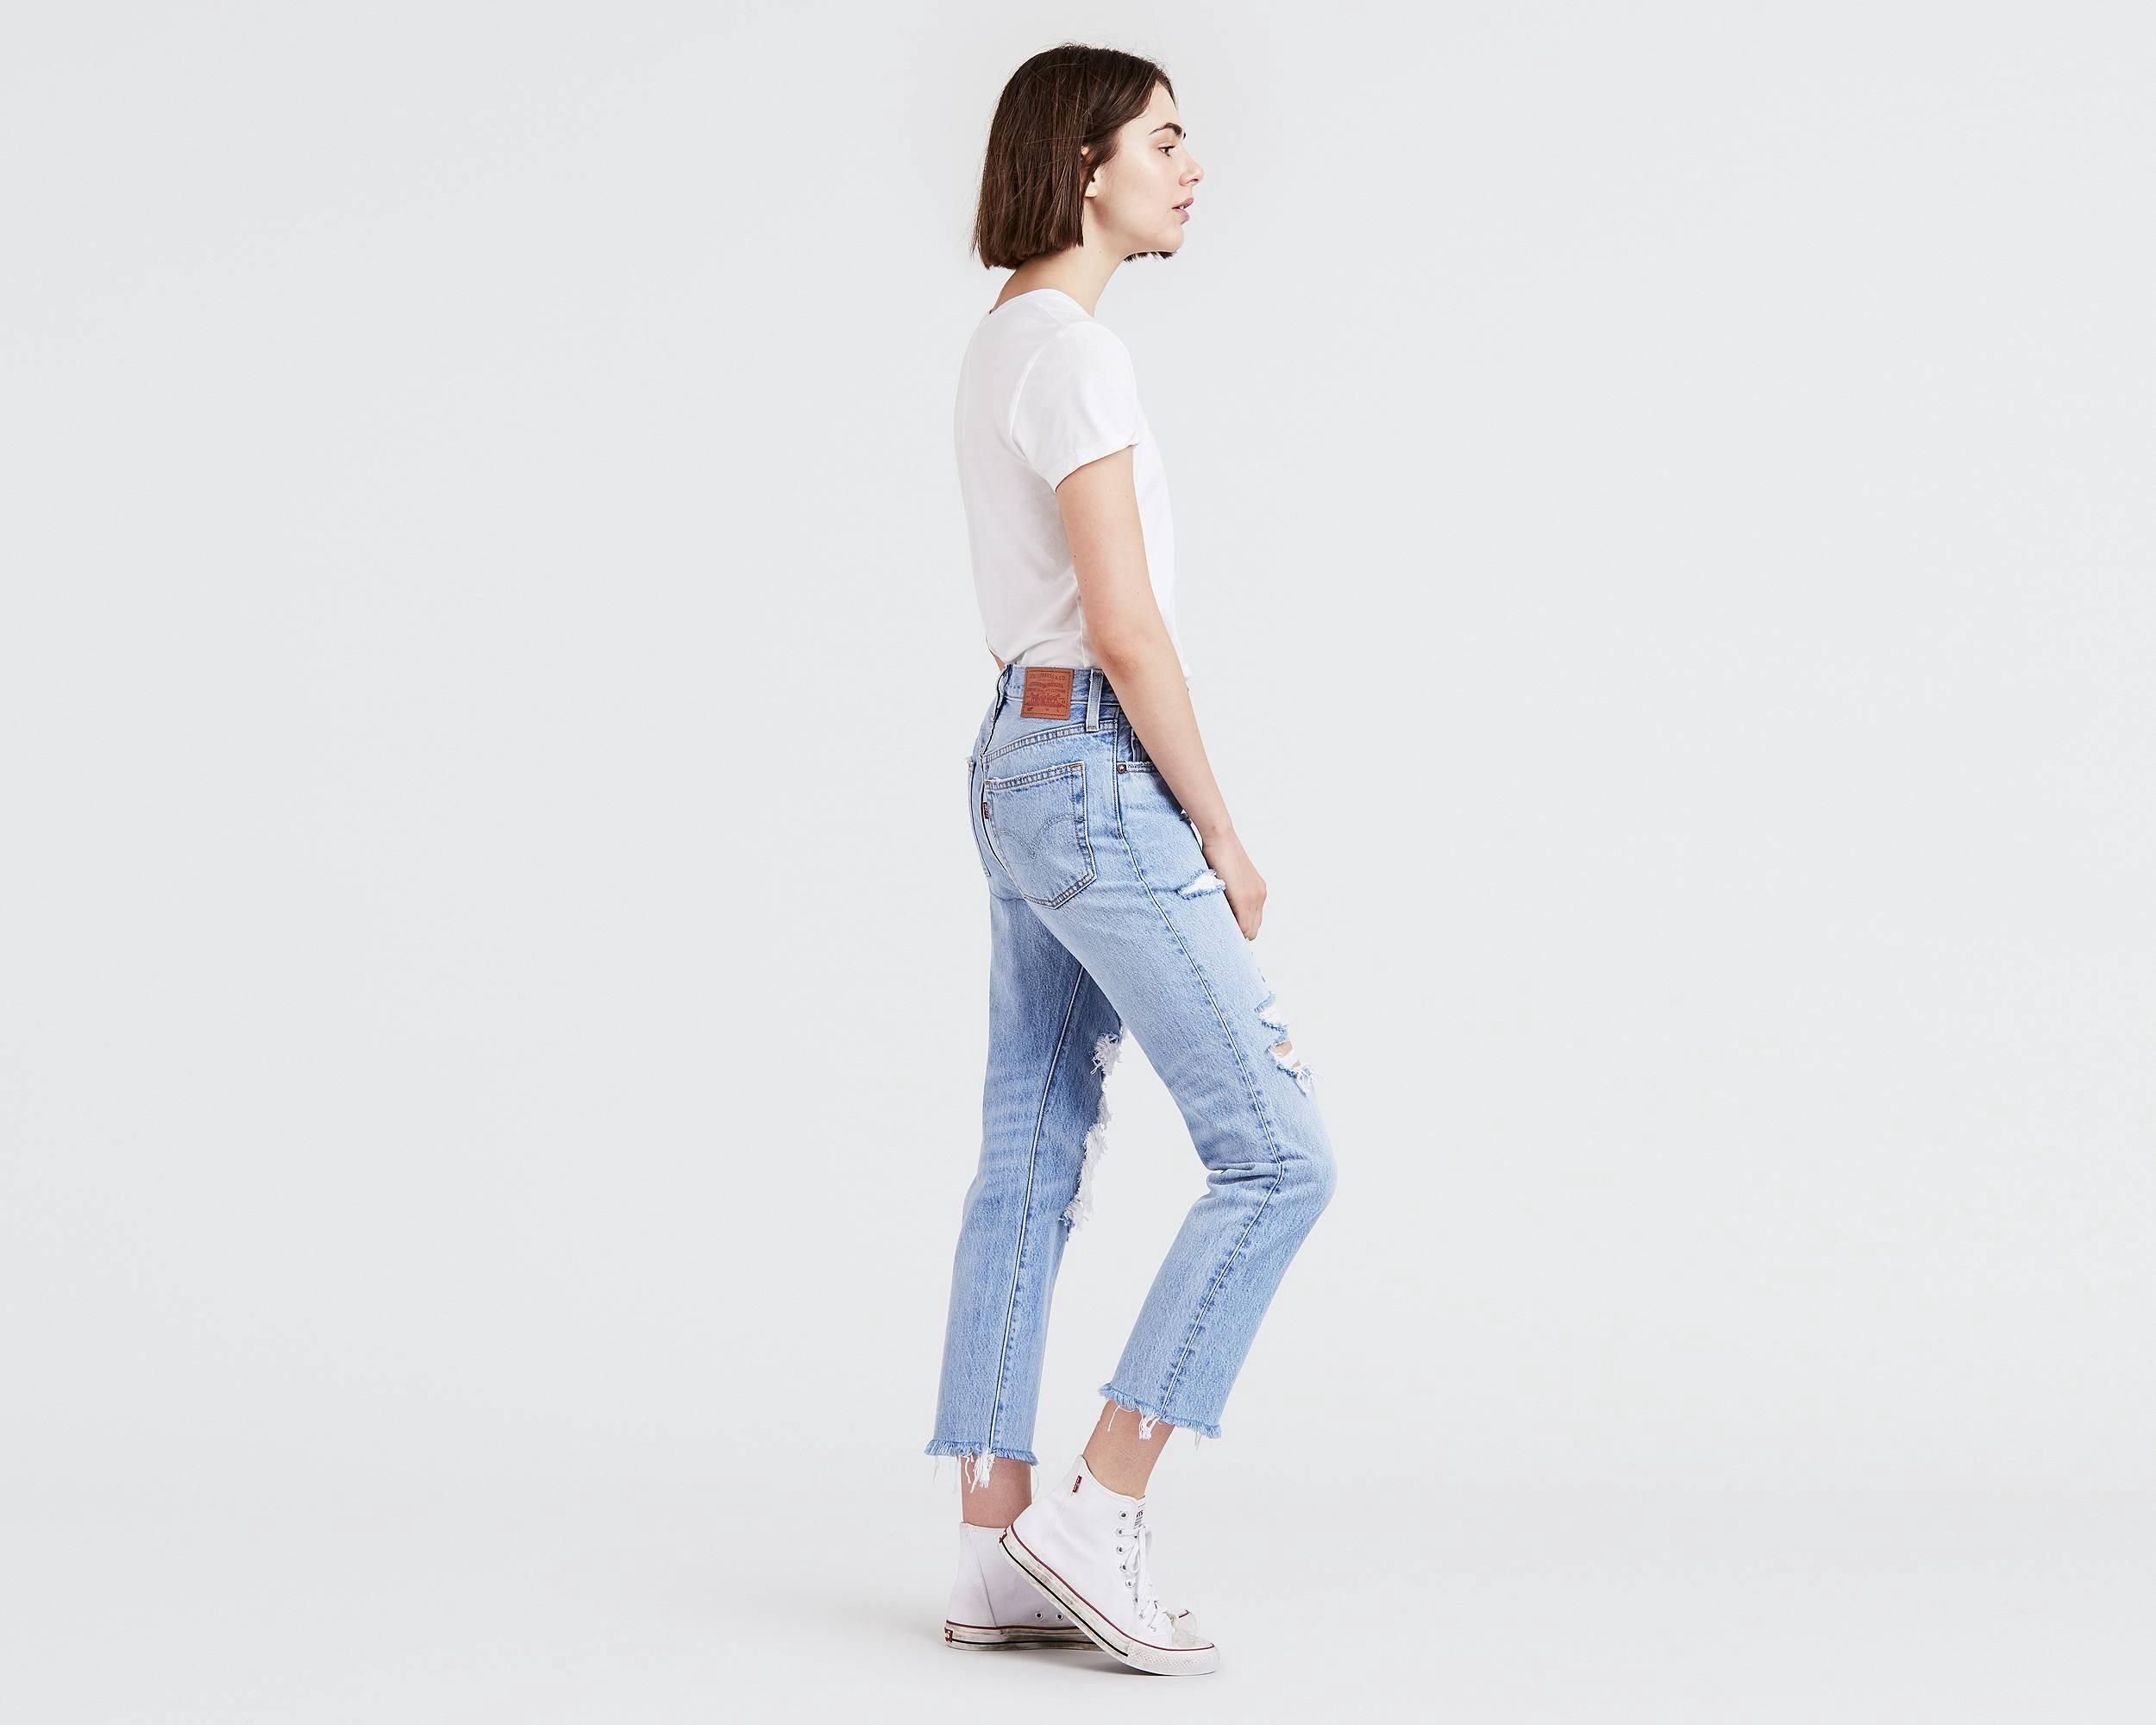 8cc59ae7be3 Levi's 501® Original Cropped Jeans - Bona Fide 30W X 28L | Products ...